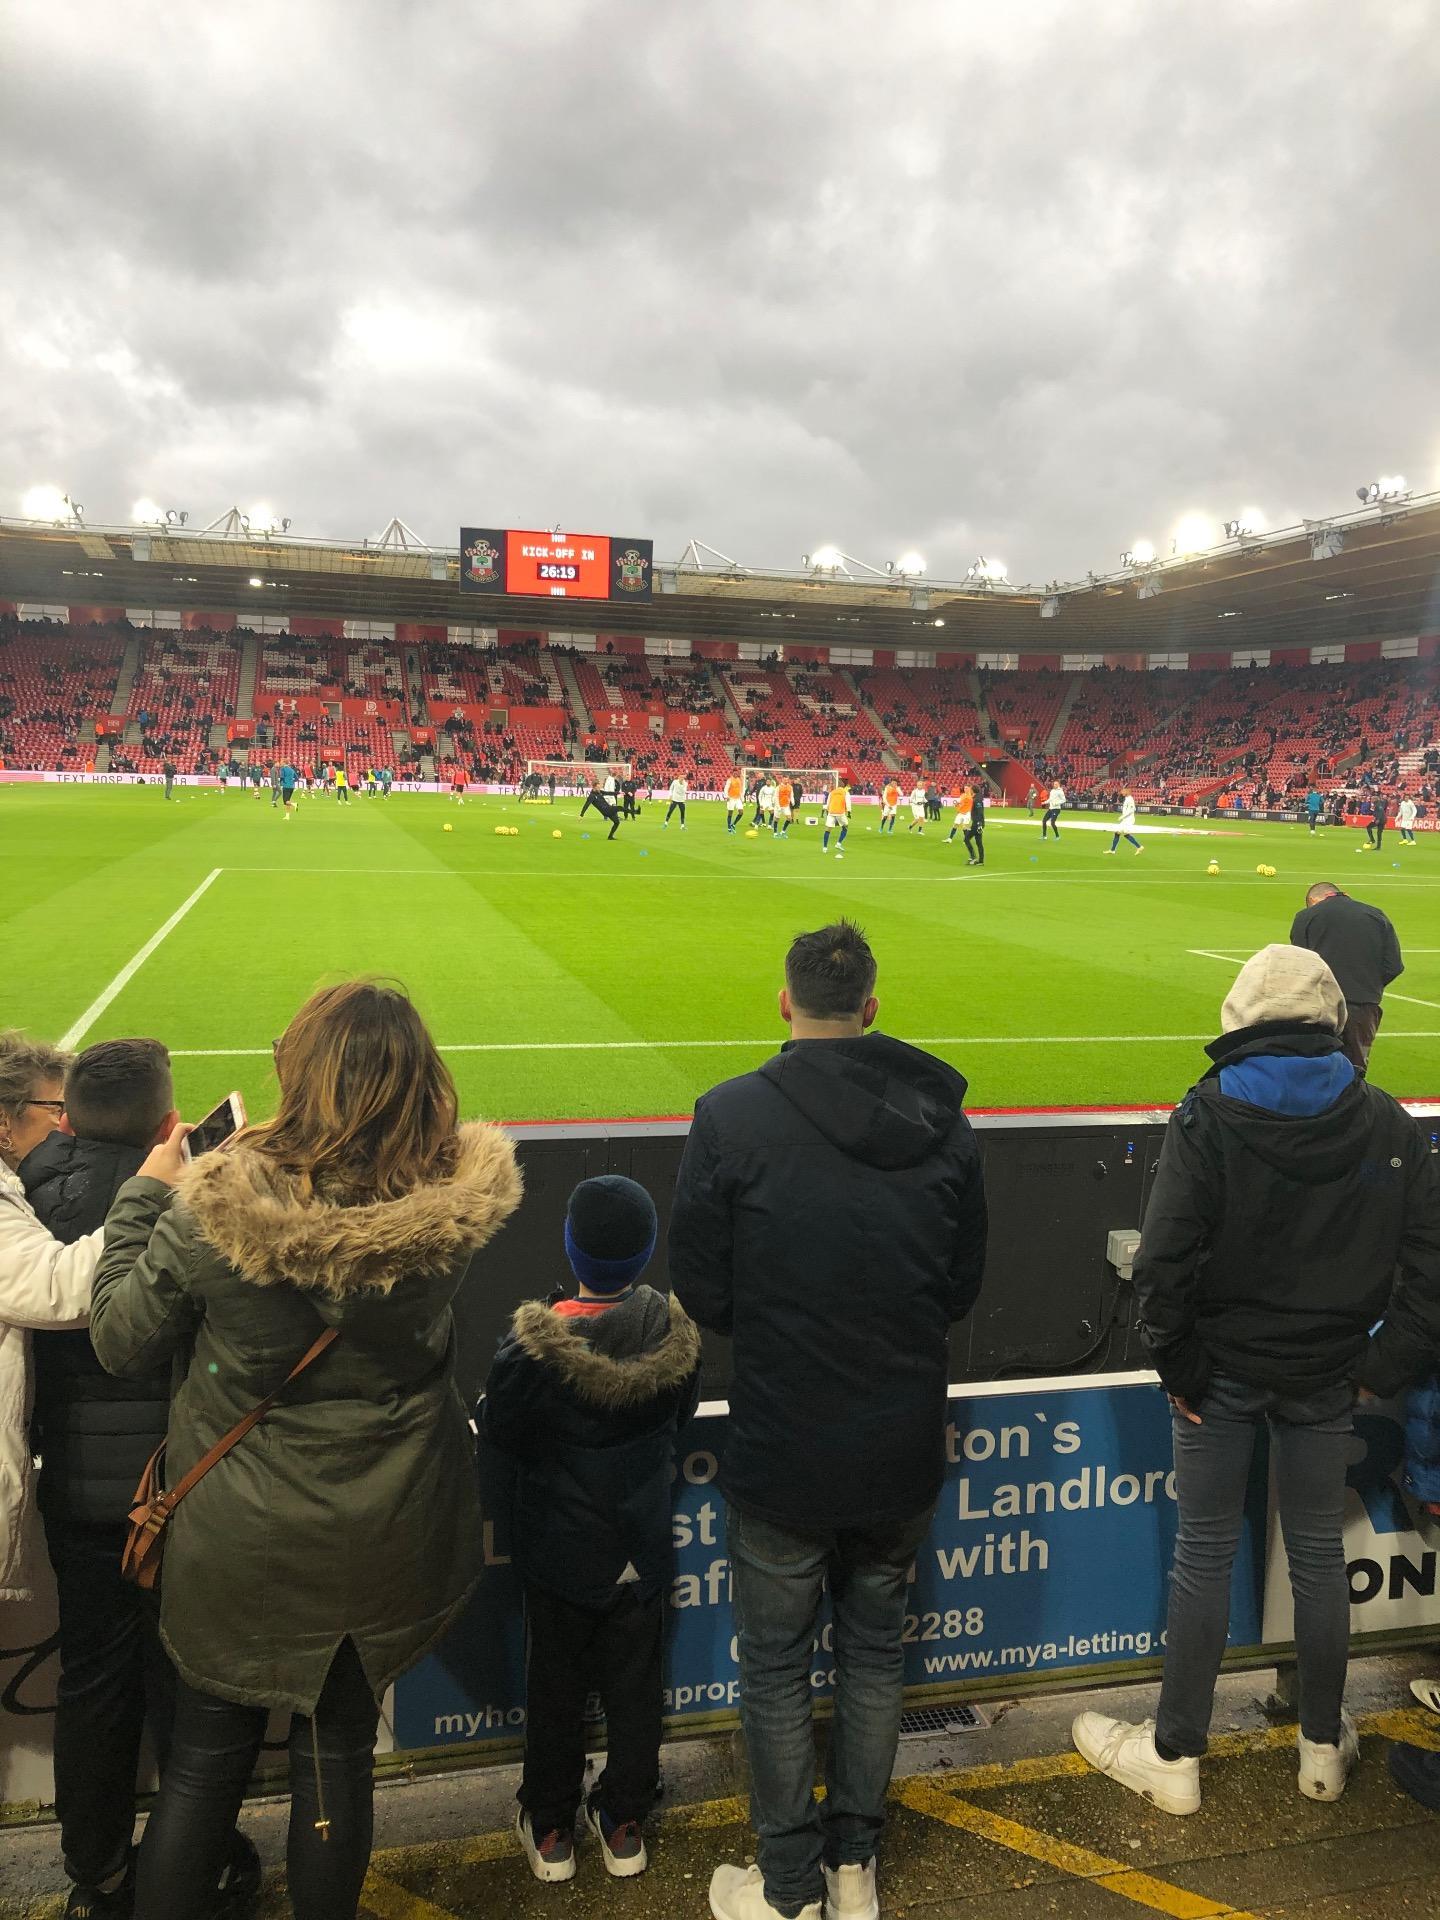 St Mary's Stadium Section 44 Row C Seat 1150